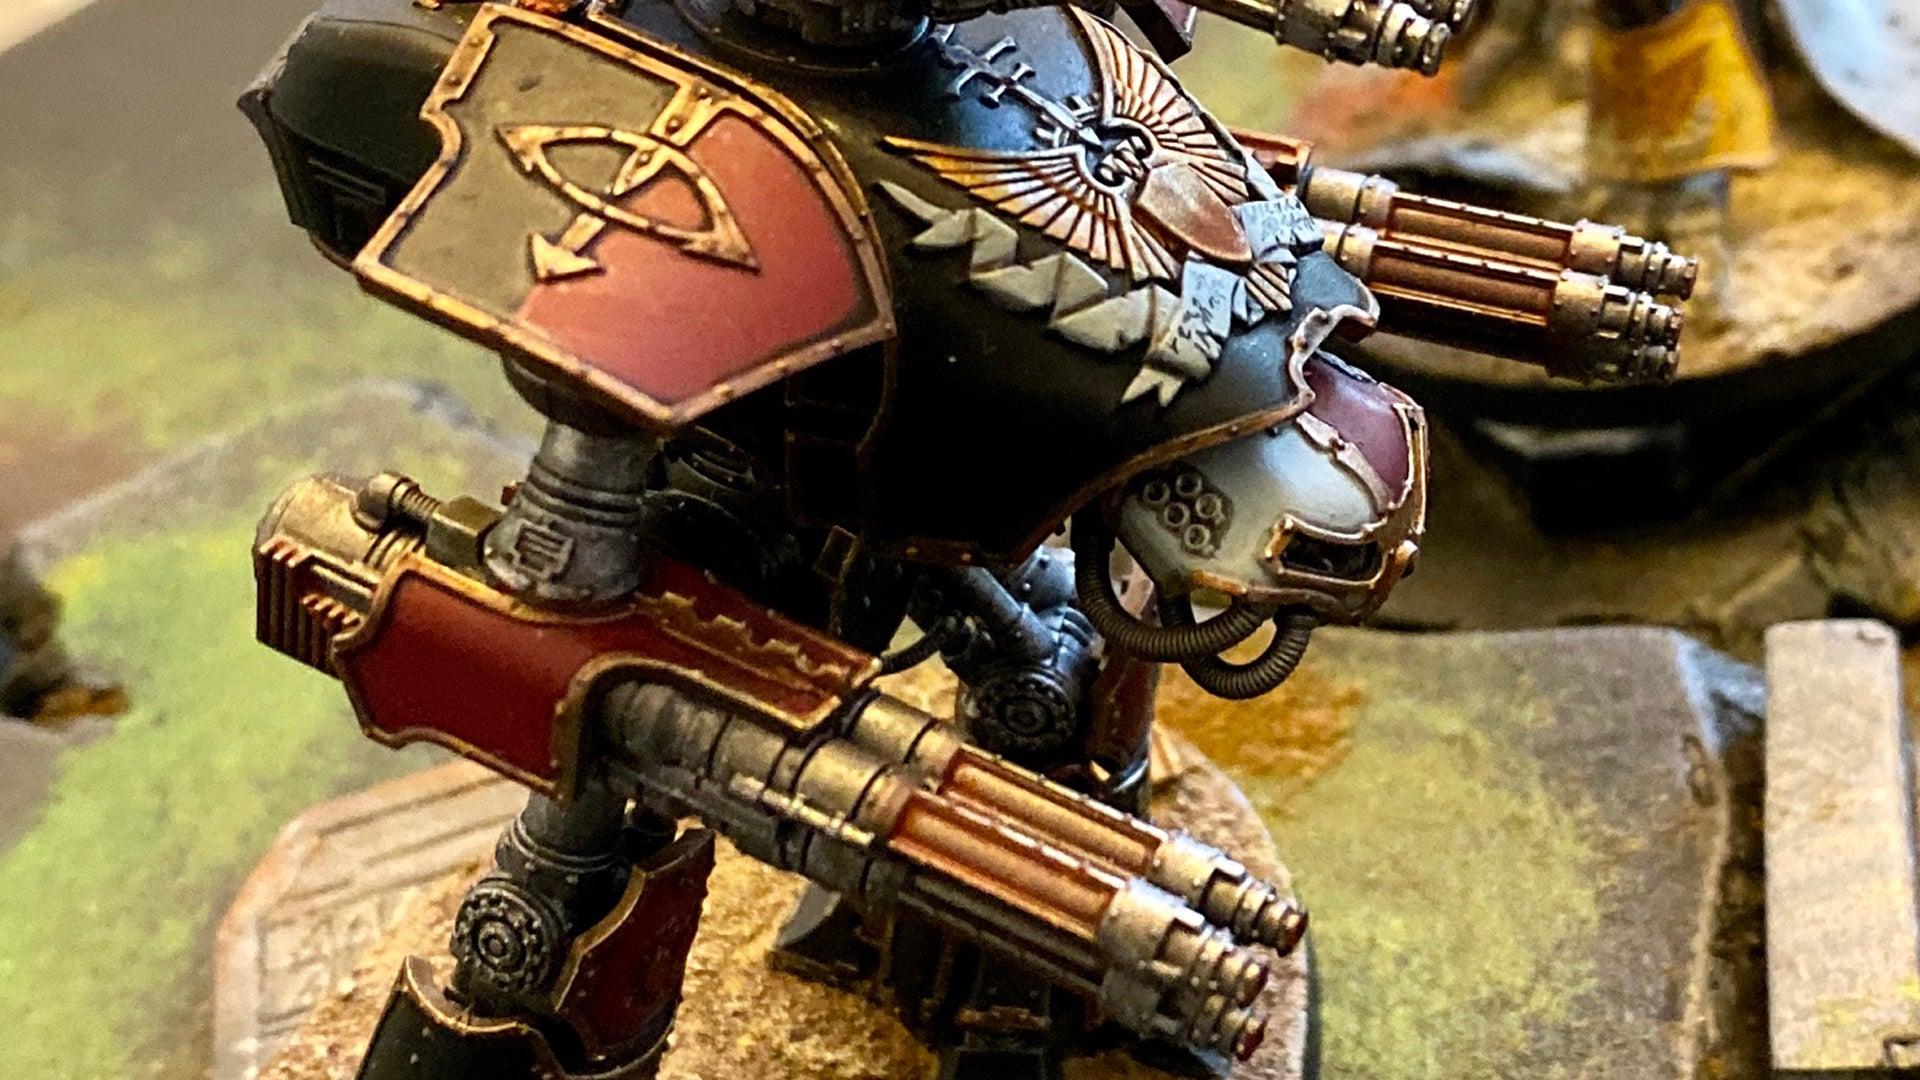 warhammer-40k-adeptus-titanicus-6.jpg